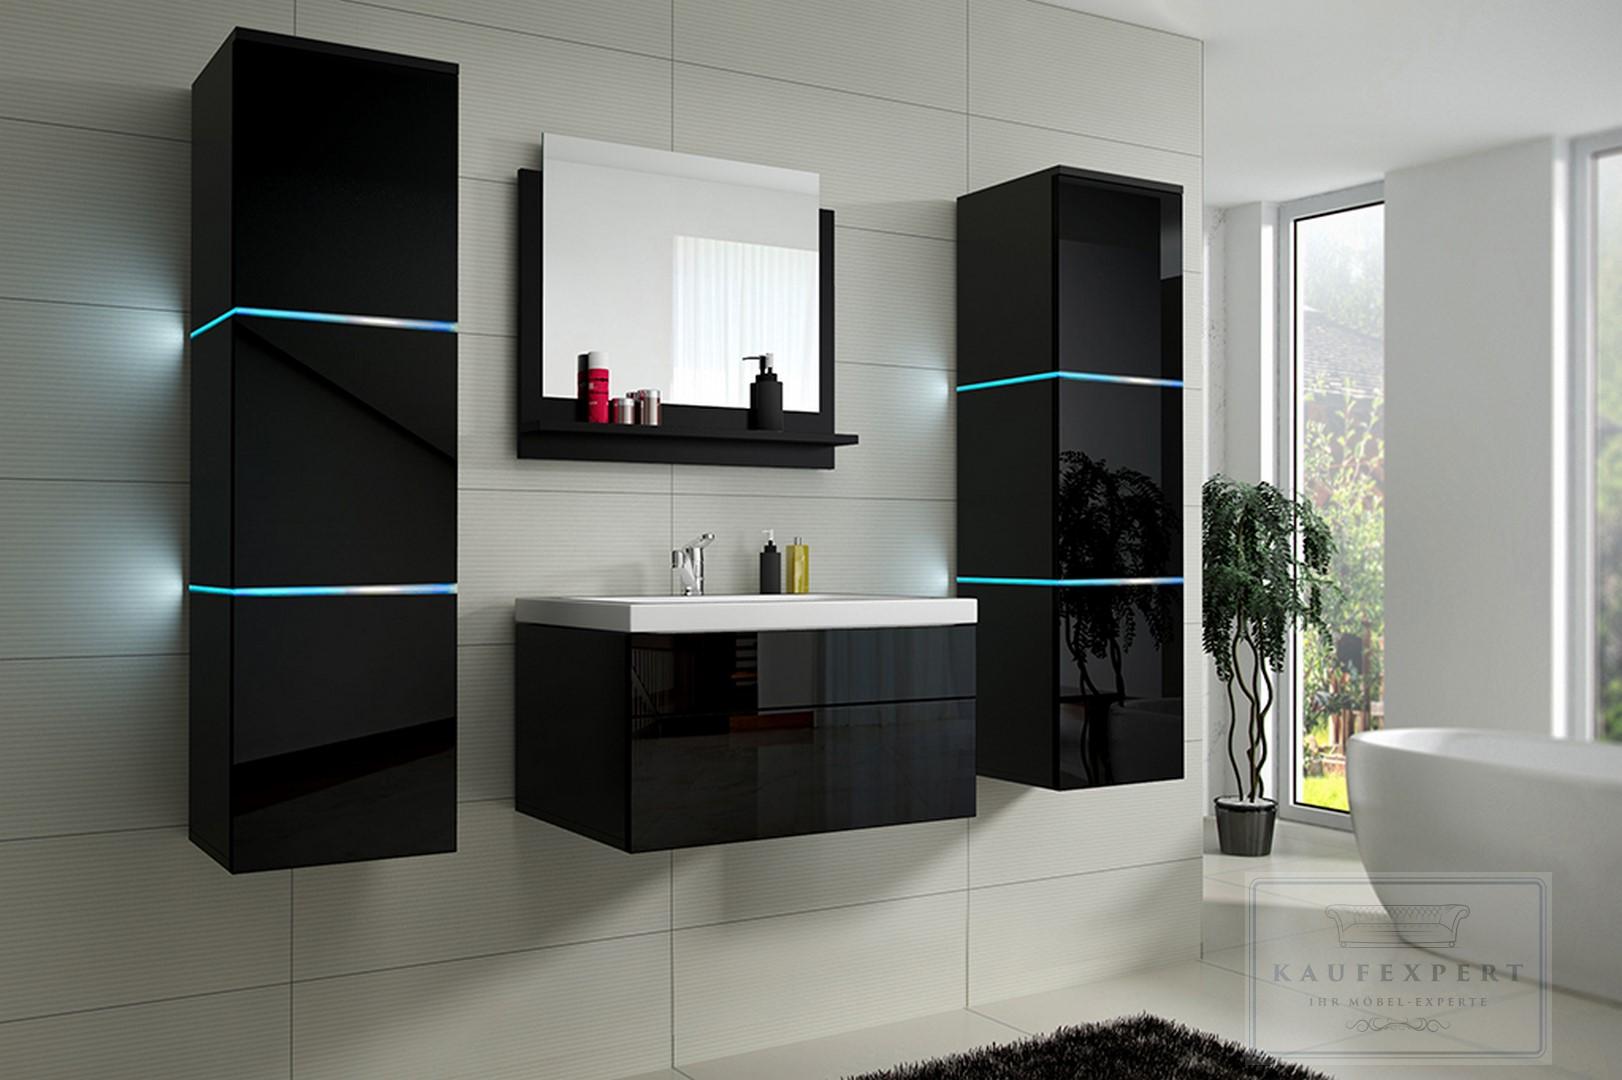 Badezimmer Möbel Set Angebot: Design Badmöbel Online Kaufen ... Moderne Badmoebel Artesi Hochglanz Holz